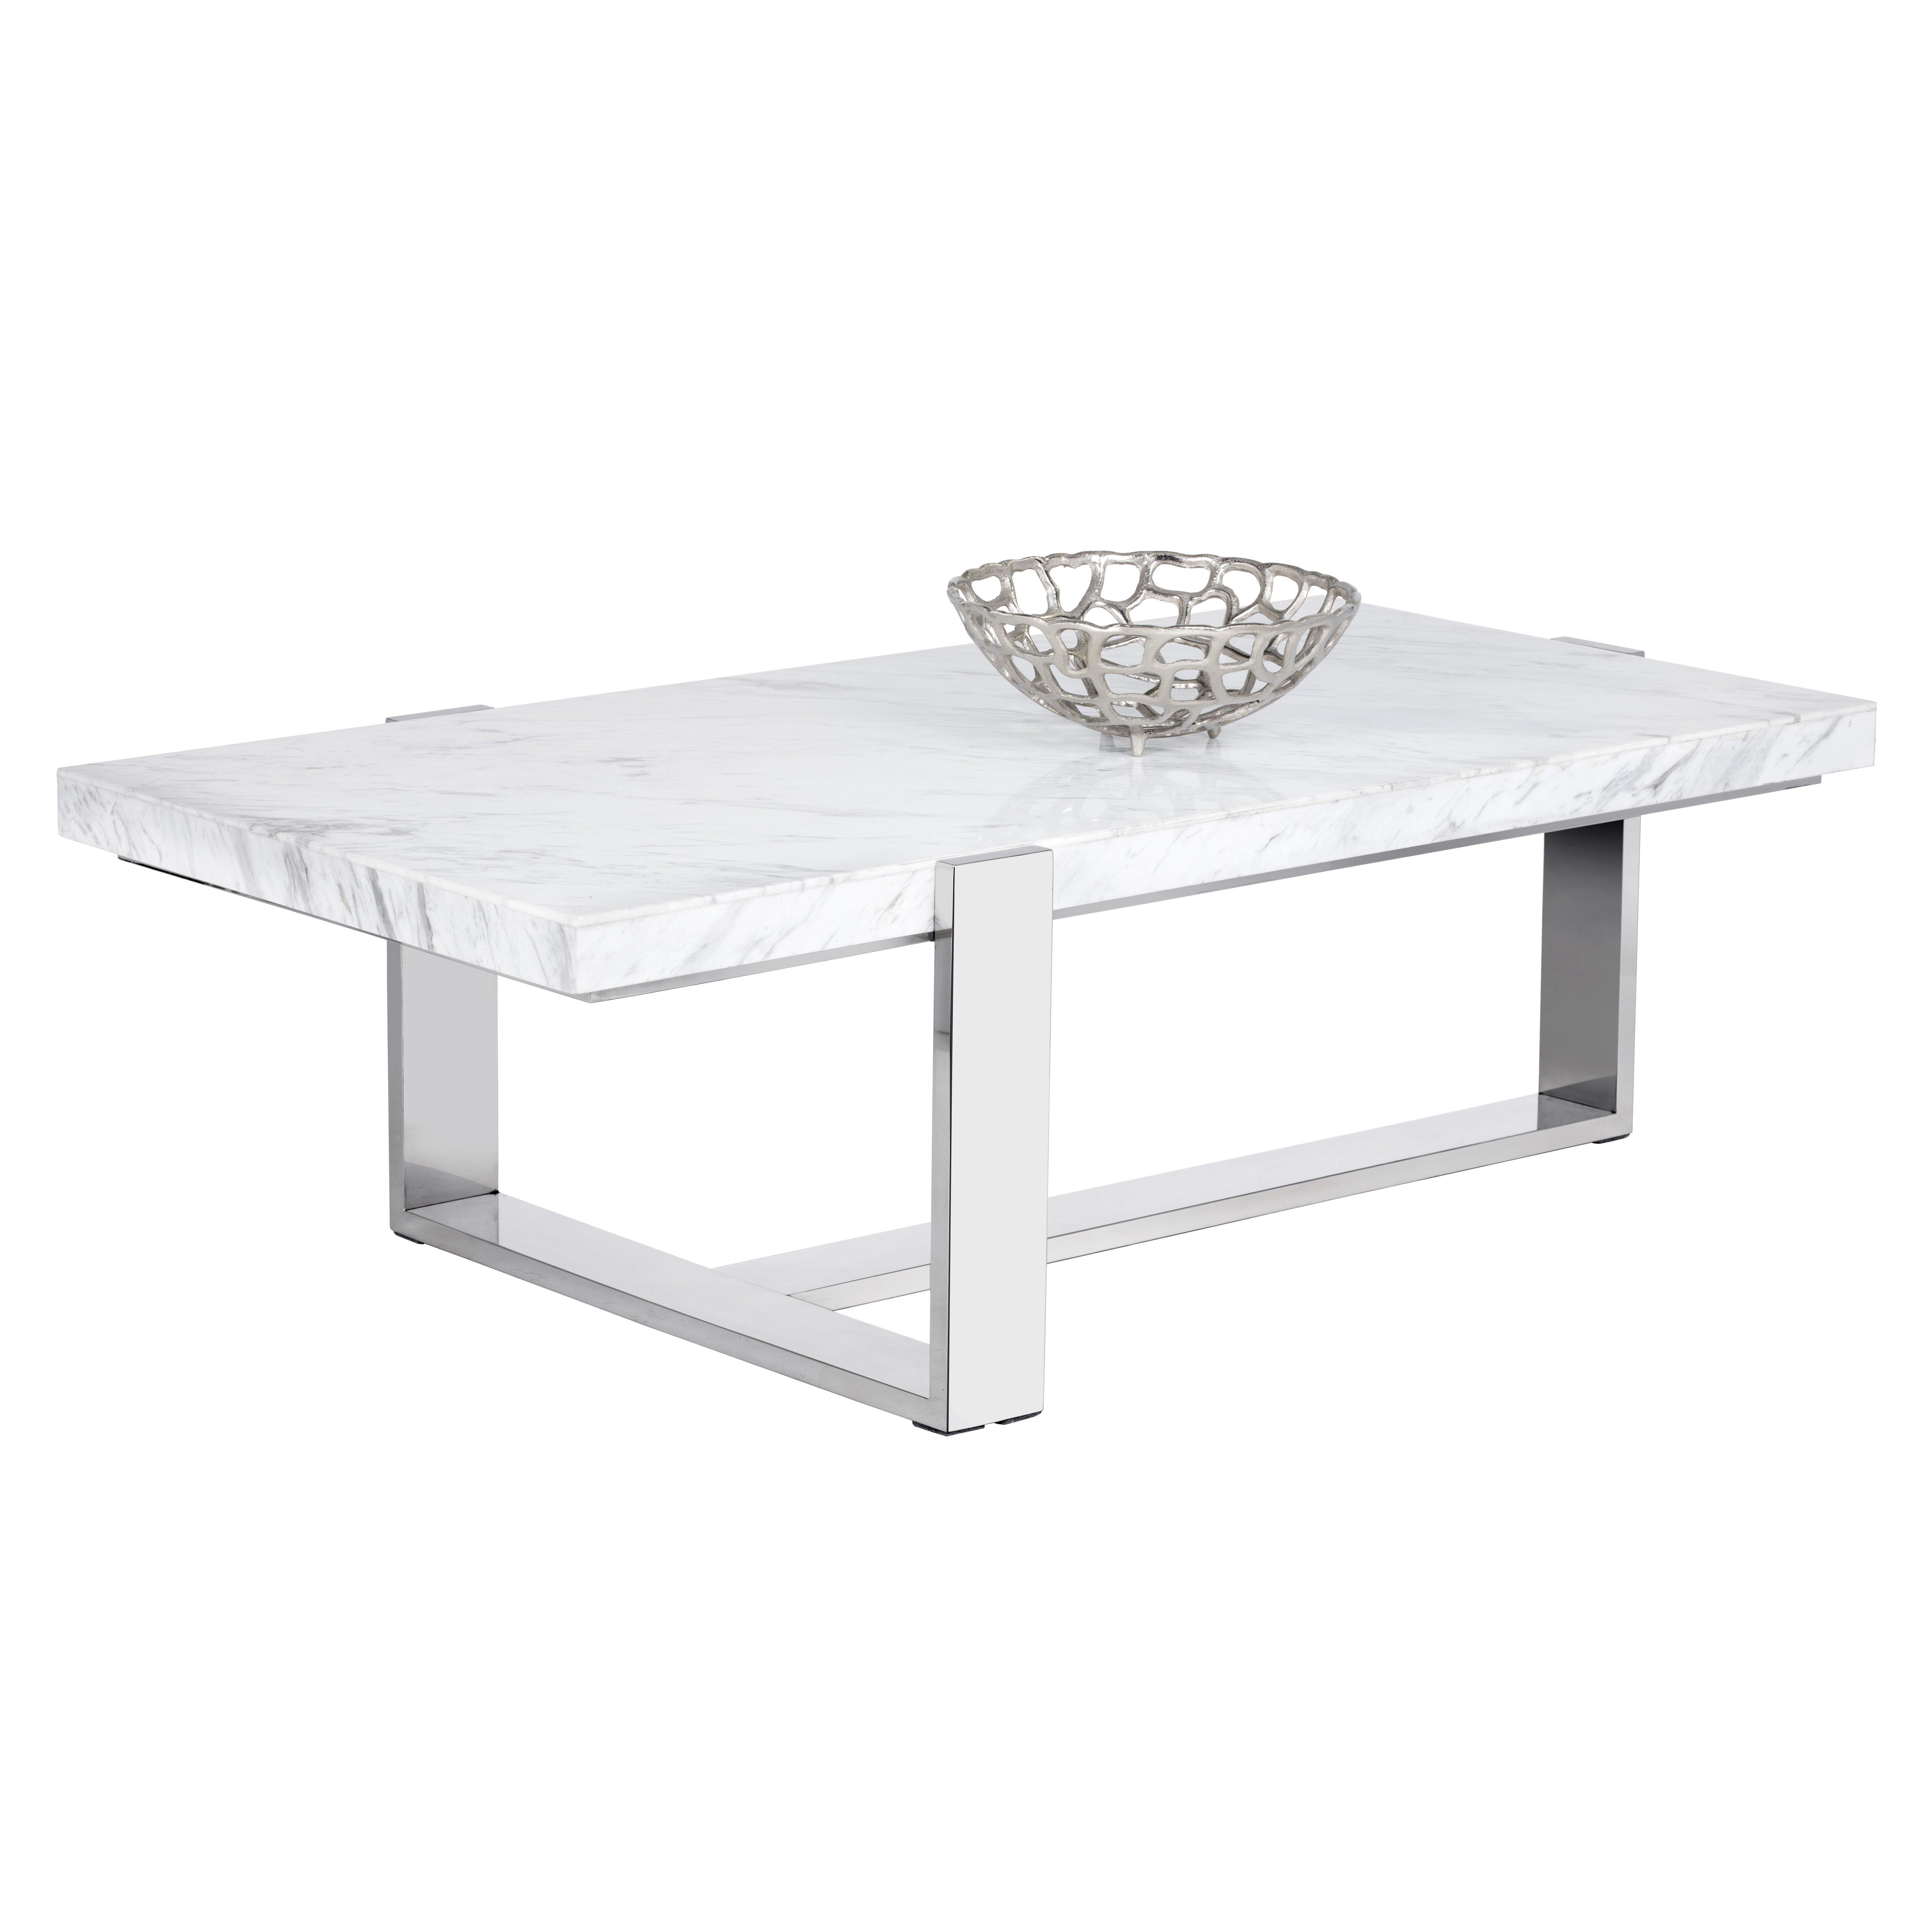 mercer41 rushden coffee table wayfair. Black Bedroom Furniture Sets. Home Design Ideas